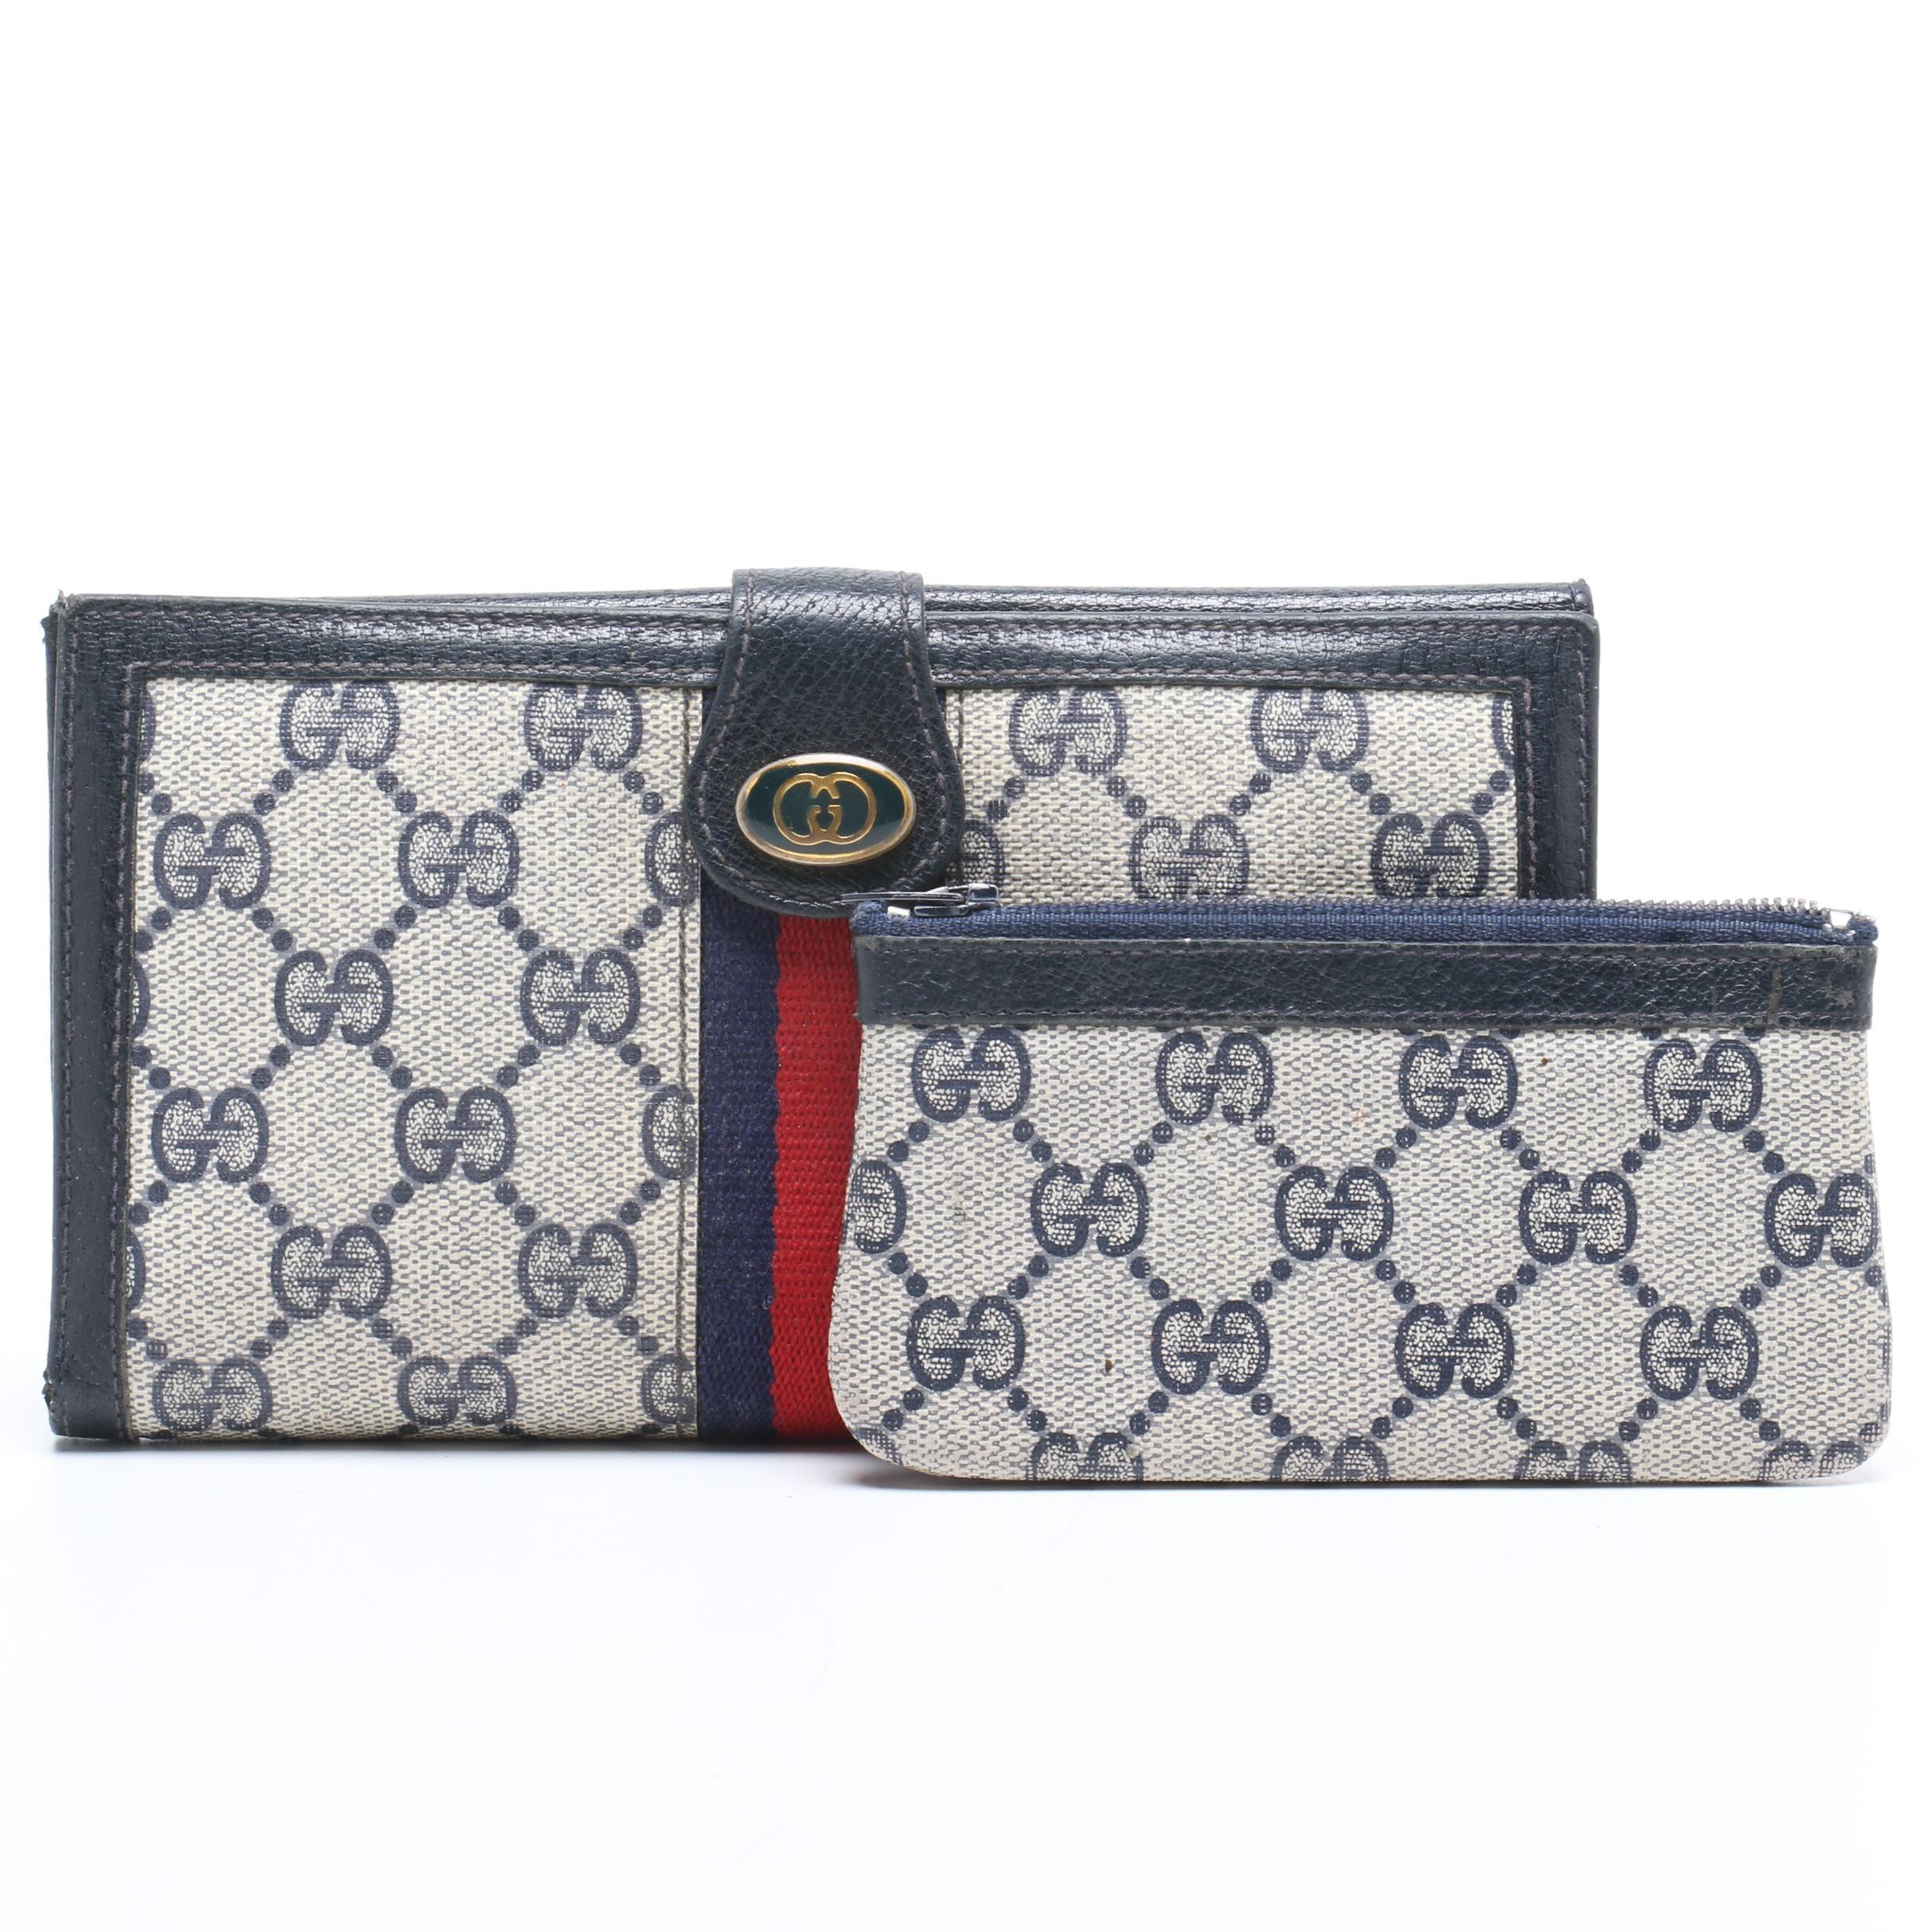 Gucci Accessory Collection GG Supreme Canvas Web Stripe Wallet and Zipper Pouch